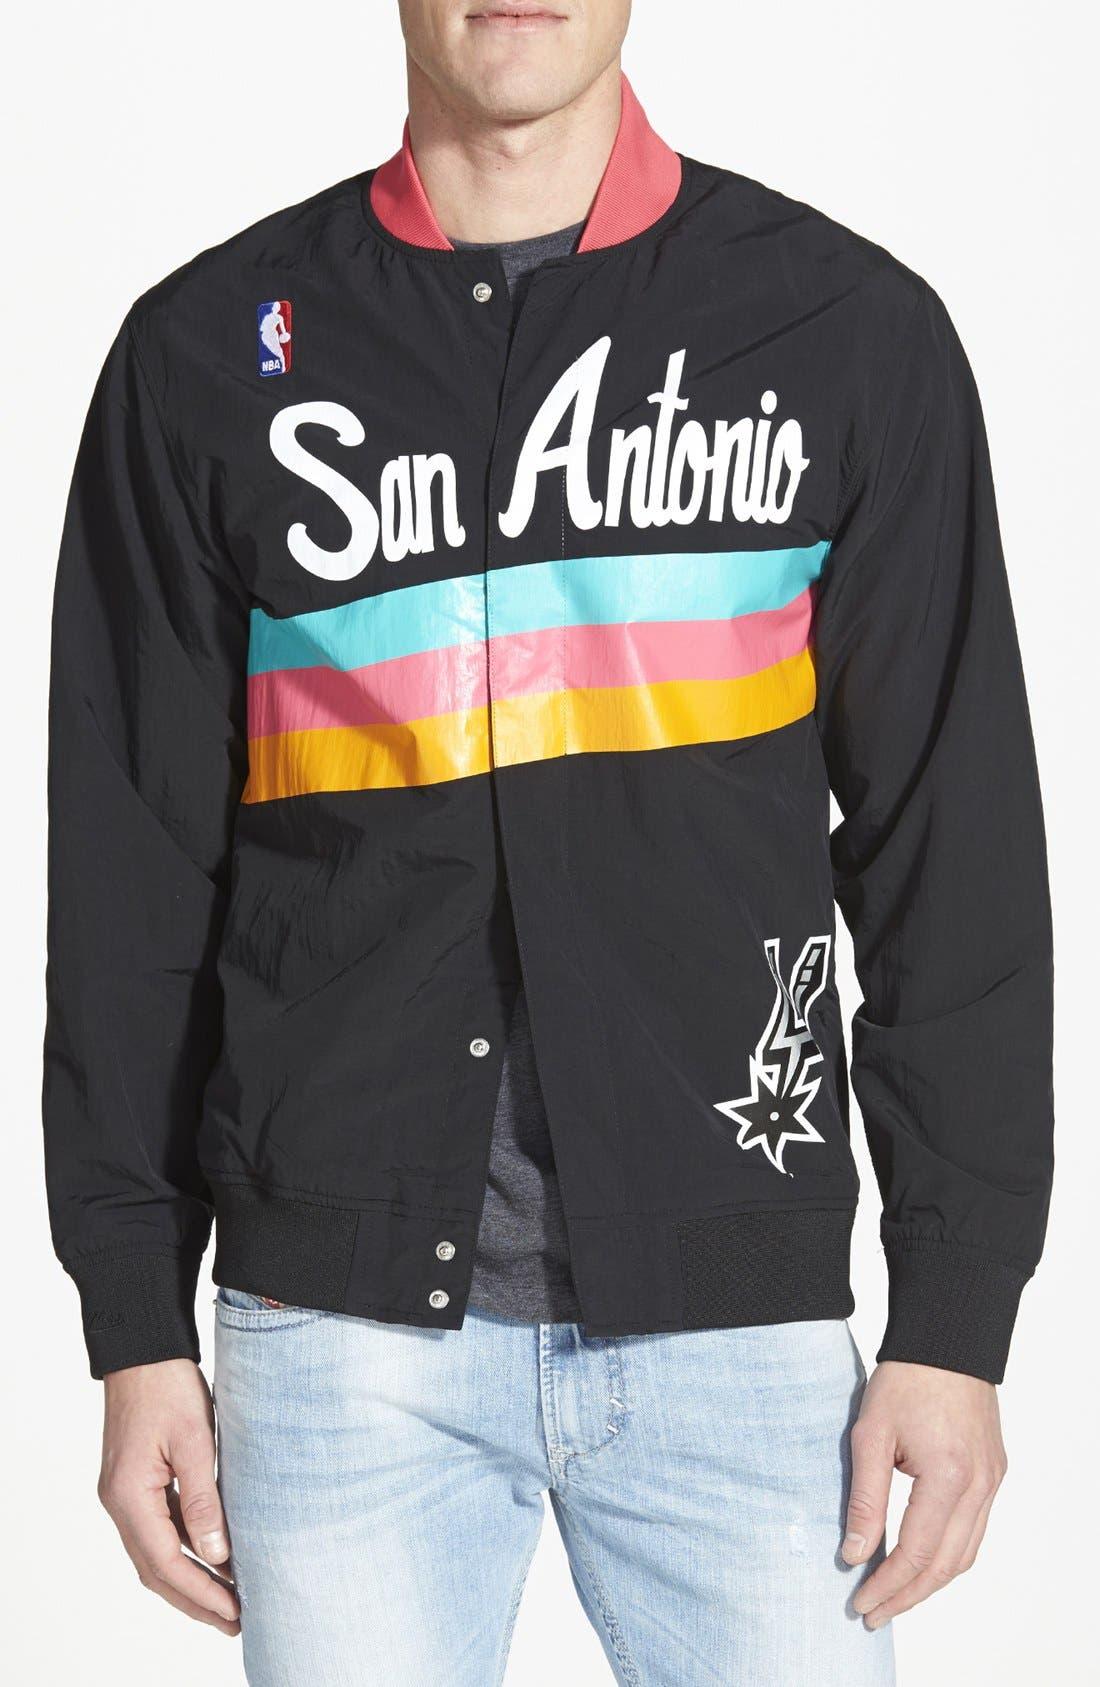 MITCHELL & NESS 'San Antonio Spurs' Warm-Up Jacket, Main, color, 001